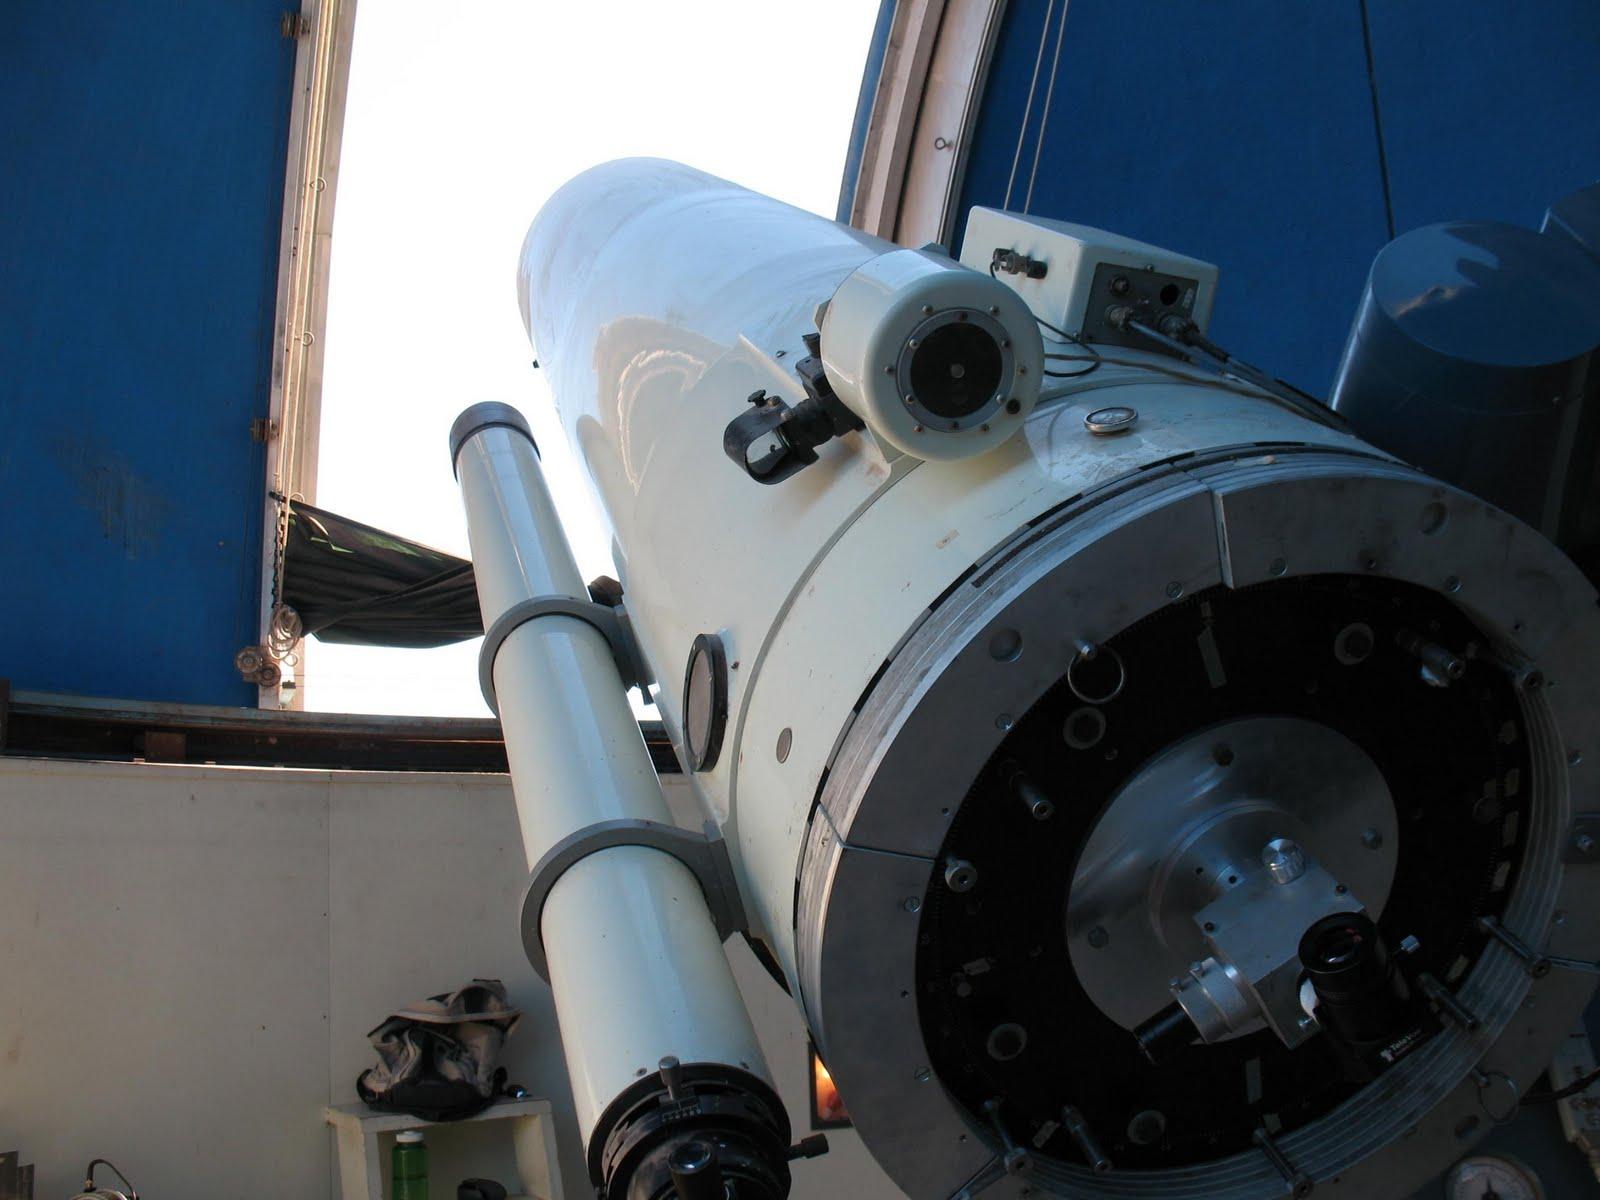 http://1.bp.blogspot.com/-_P6WBsEl8kw/TcwW_tgjGeI/AAAAAAAAACI/7c87umfwXEI/s1600/Telescope-Custom.JPG